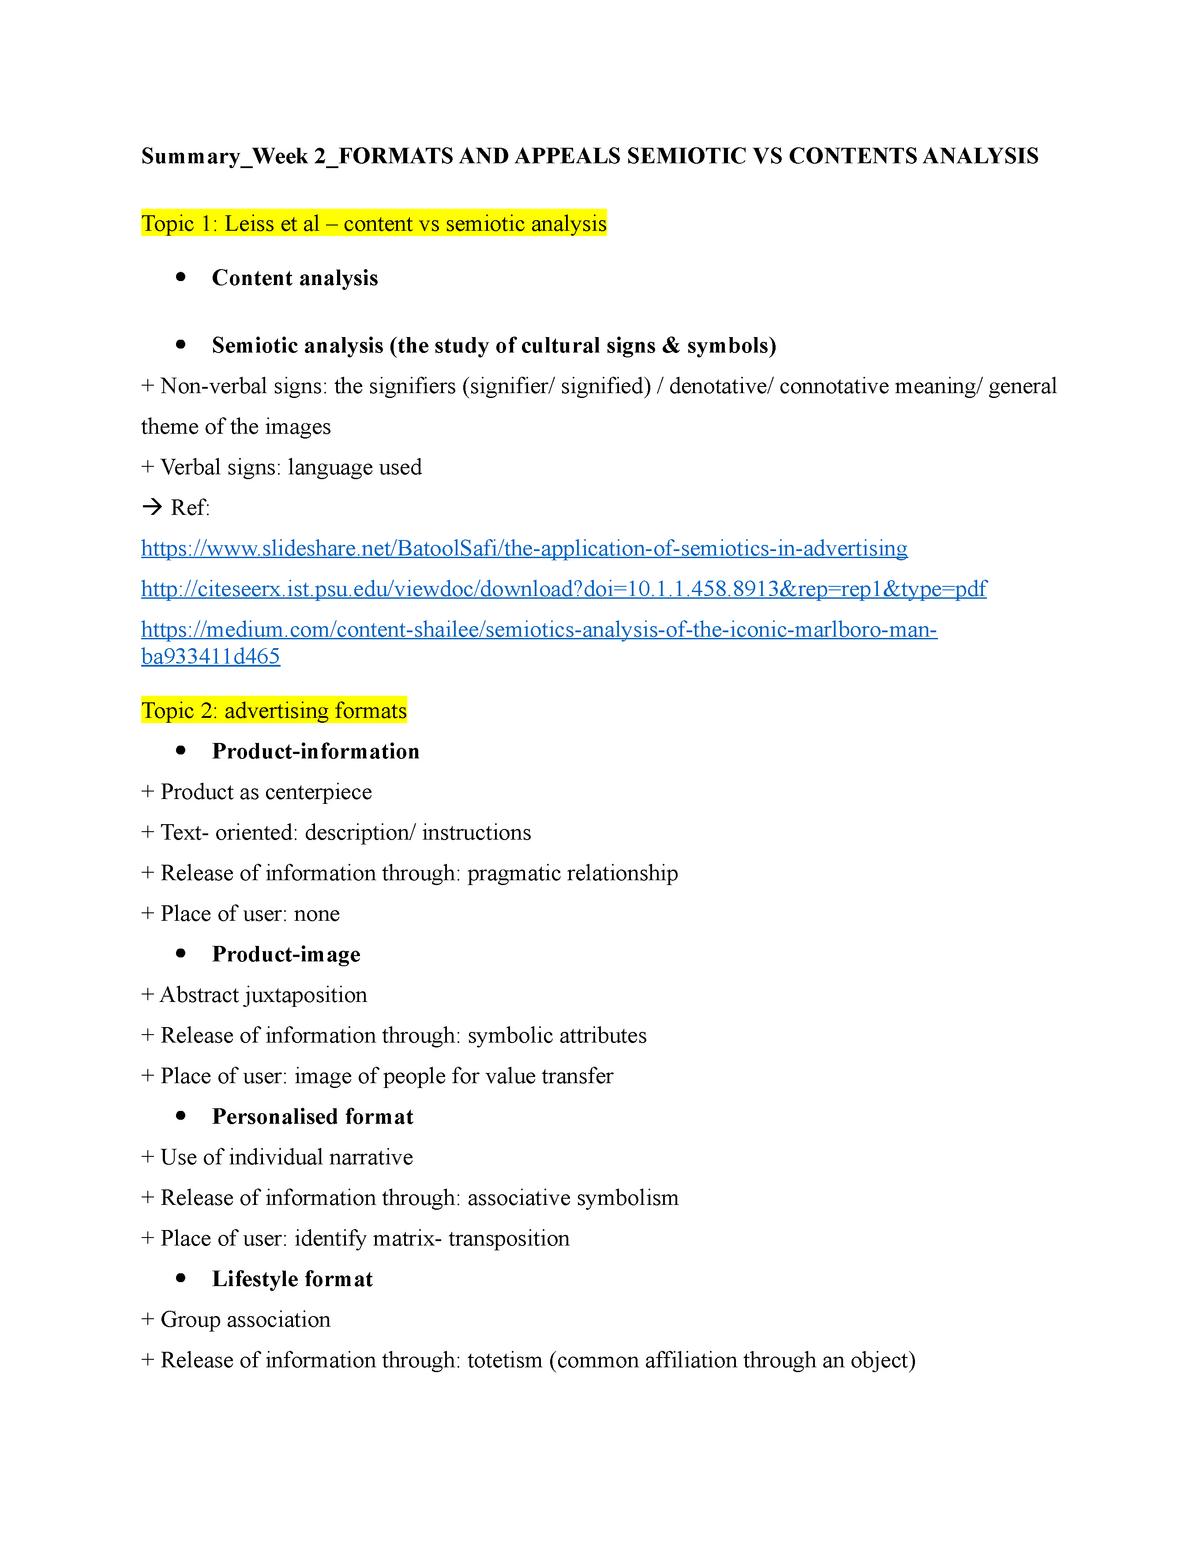 Semiotic analysis - Summary Advertising as Cultural - StuDocu